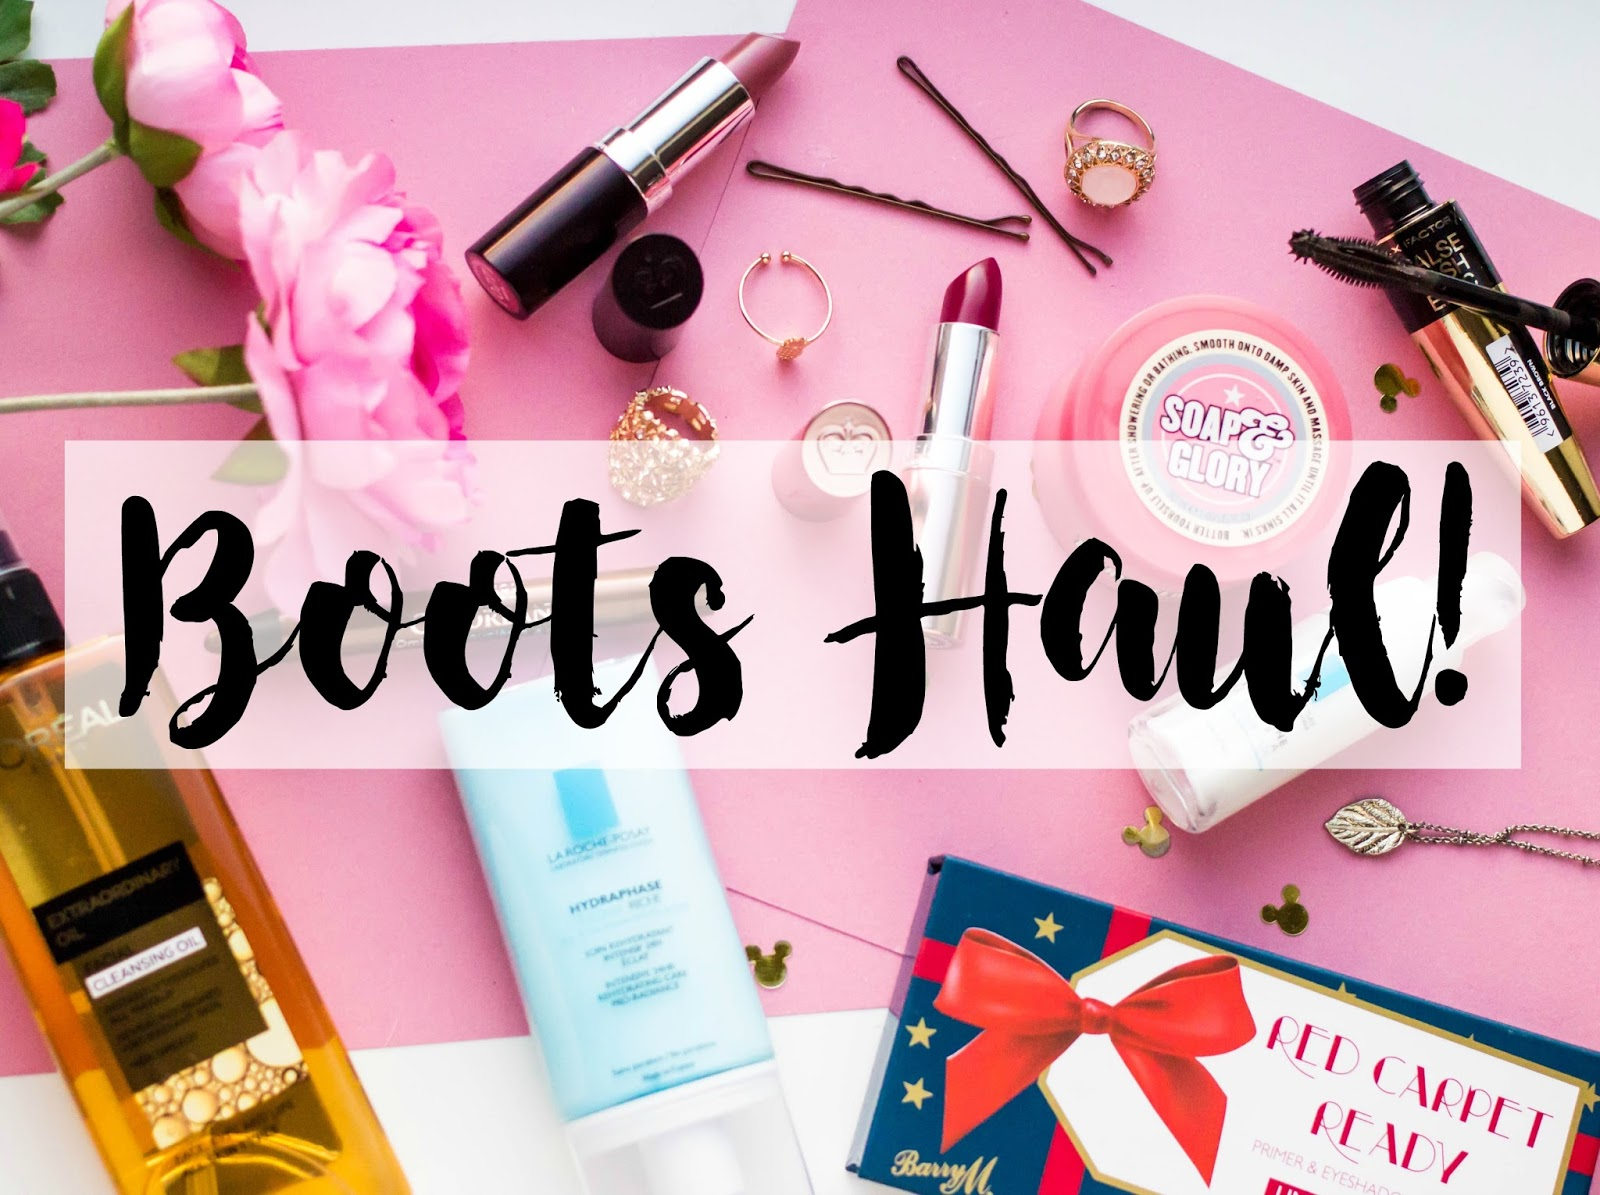 Boots Haul!